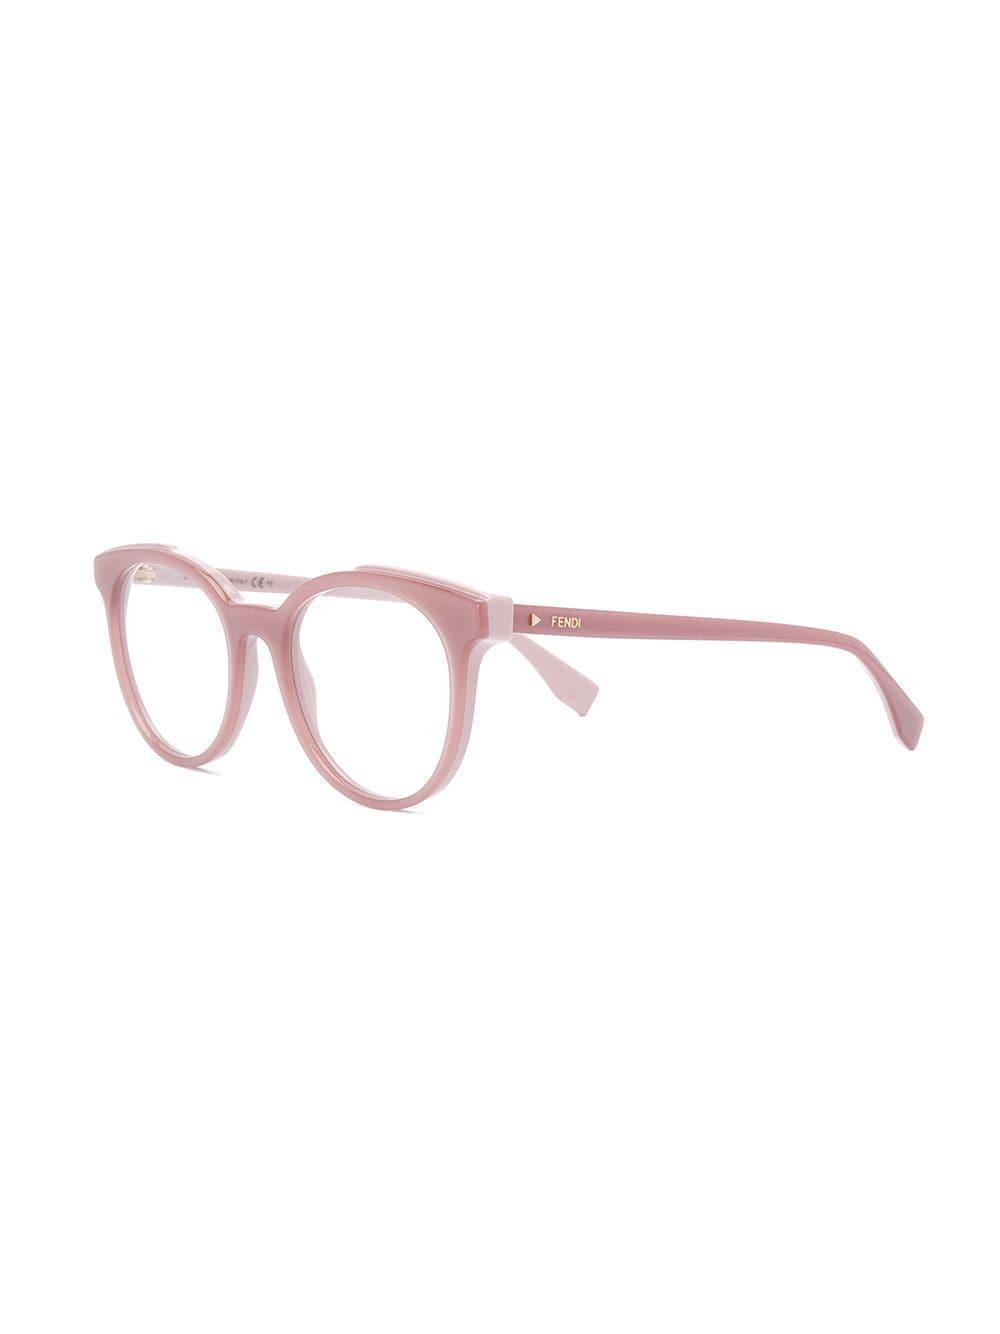 37d3f1172dd0 Lyst - Fendi Cat-eye Shaped Glasses in Pink